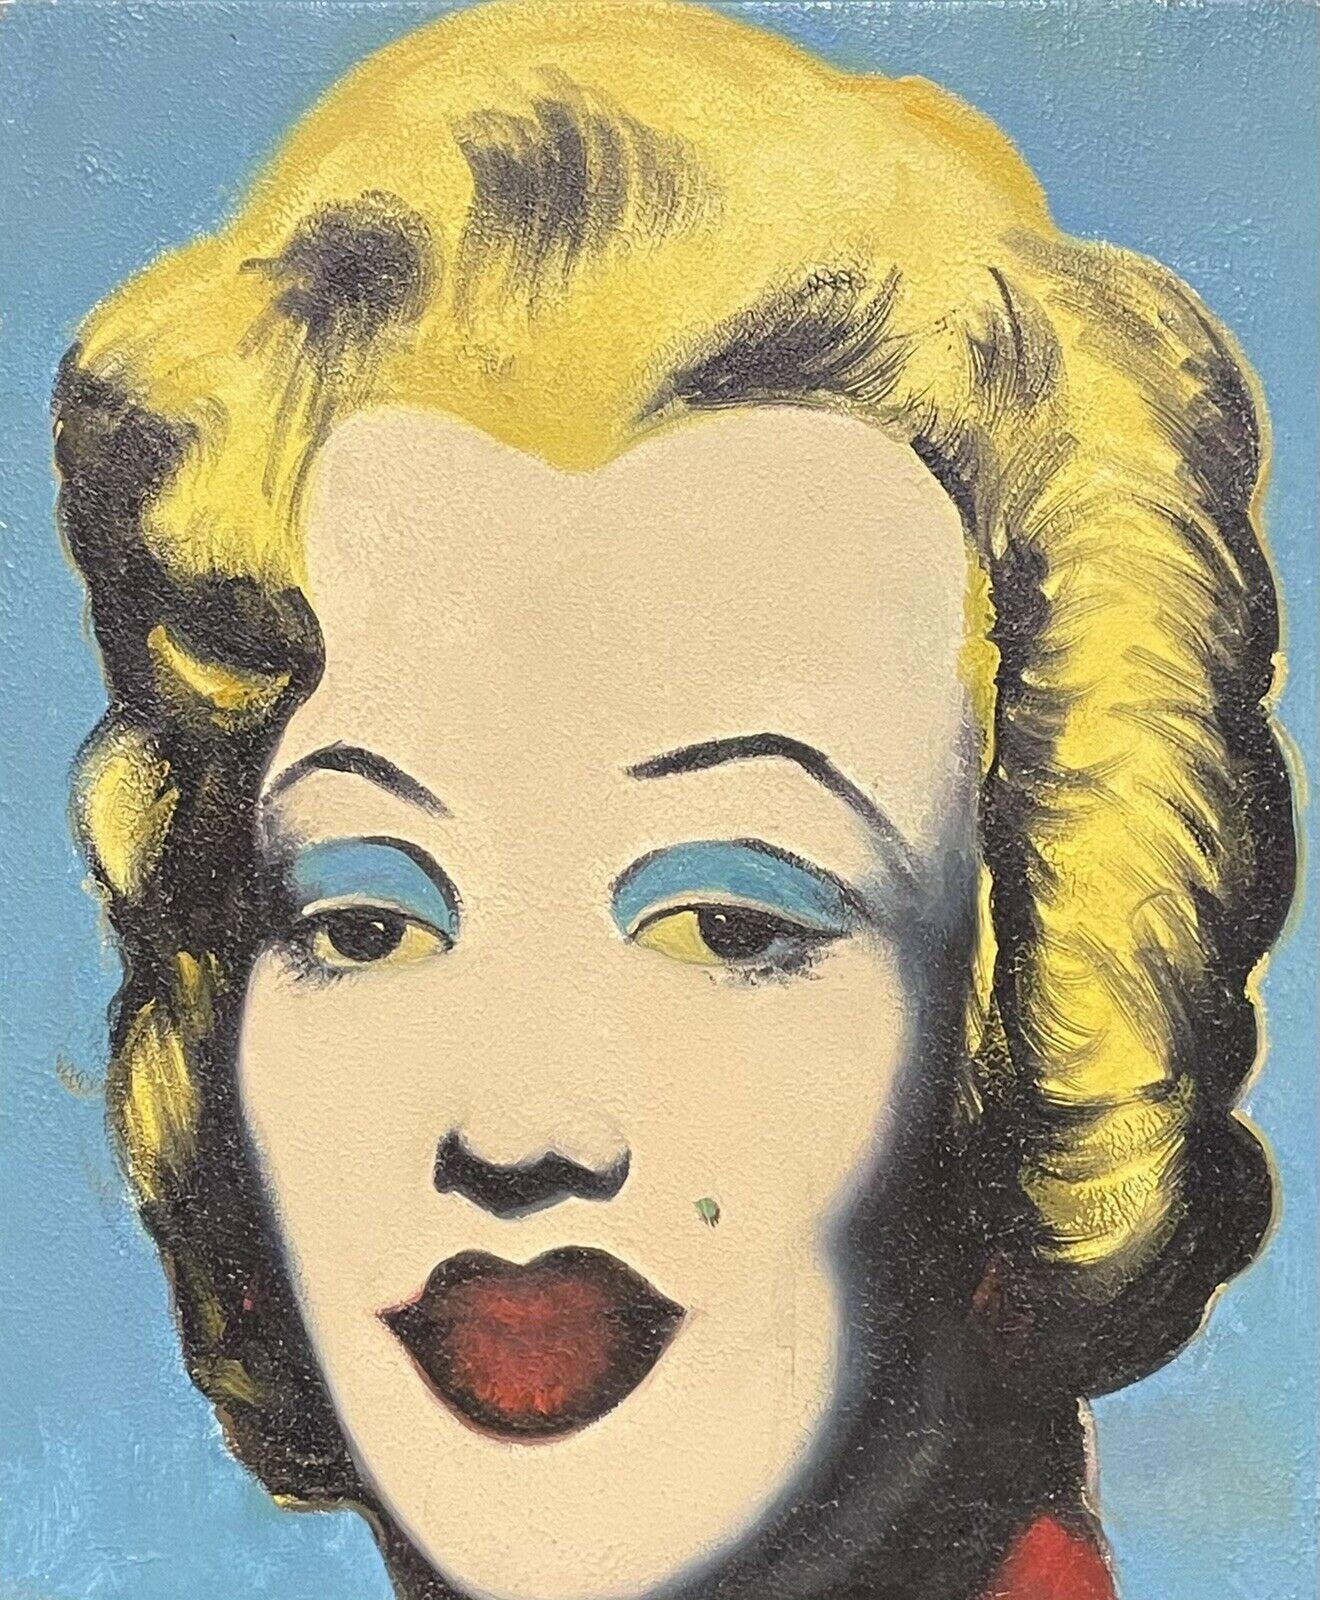 MARILYN MONROE PORTRAIT - POP ART STYLE PAINTING